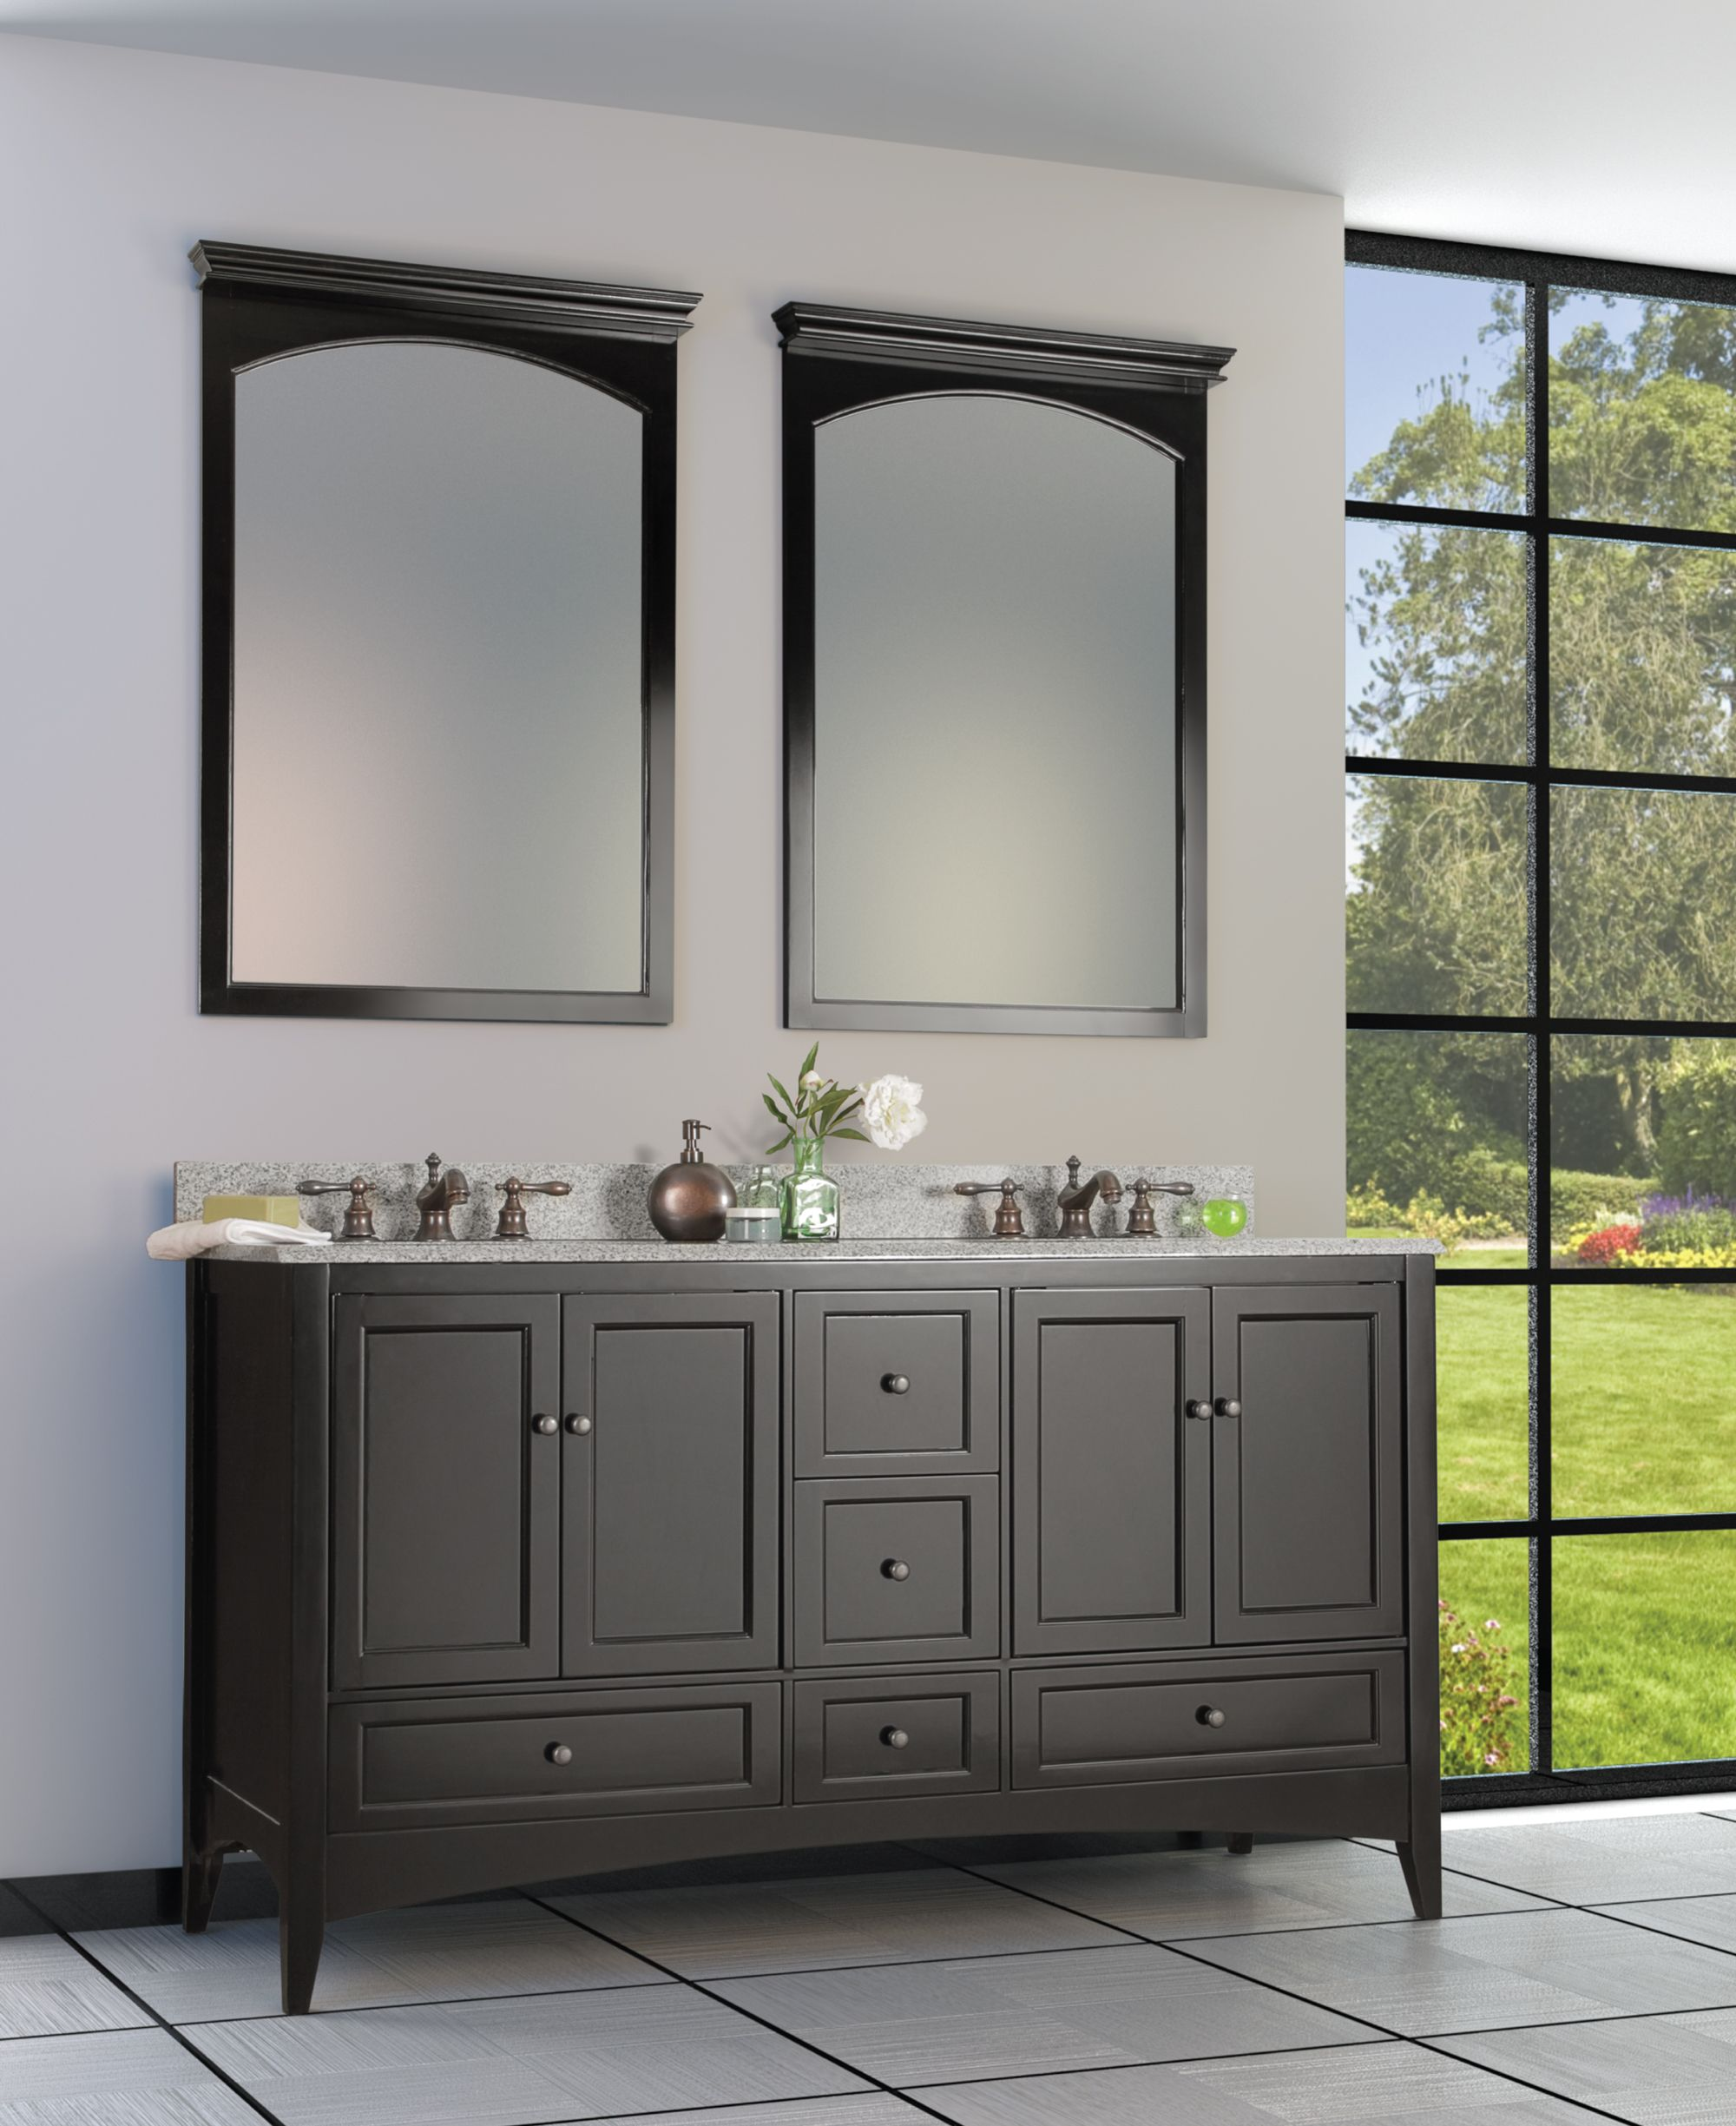 Foremost Bathroom Vanity Foremost Bathroom Vanity Cabinets